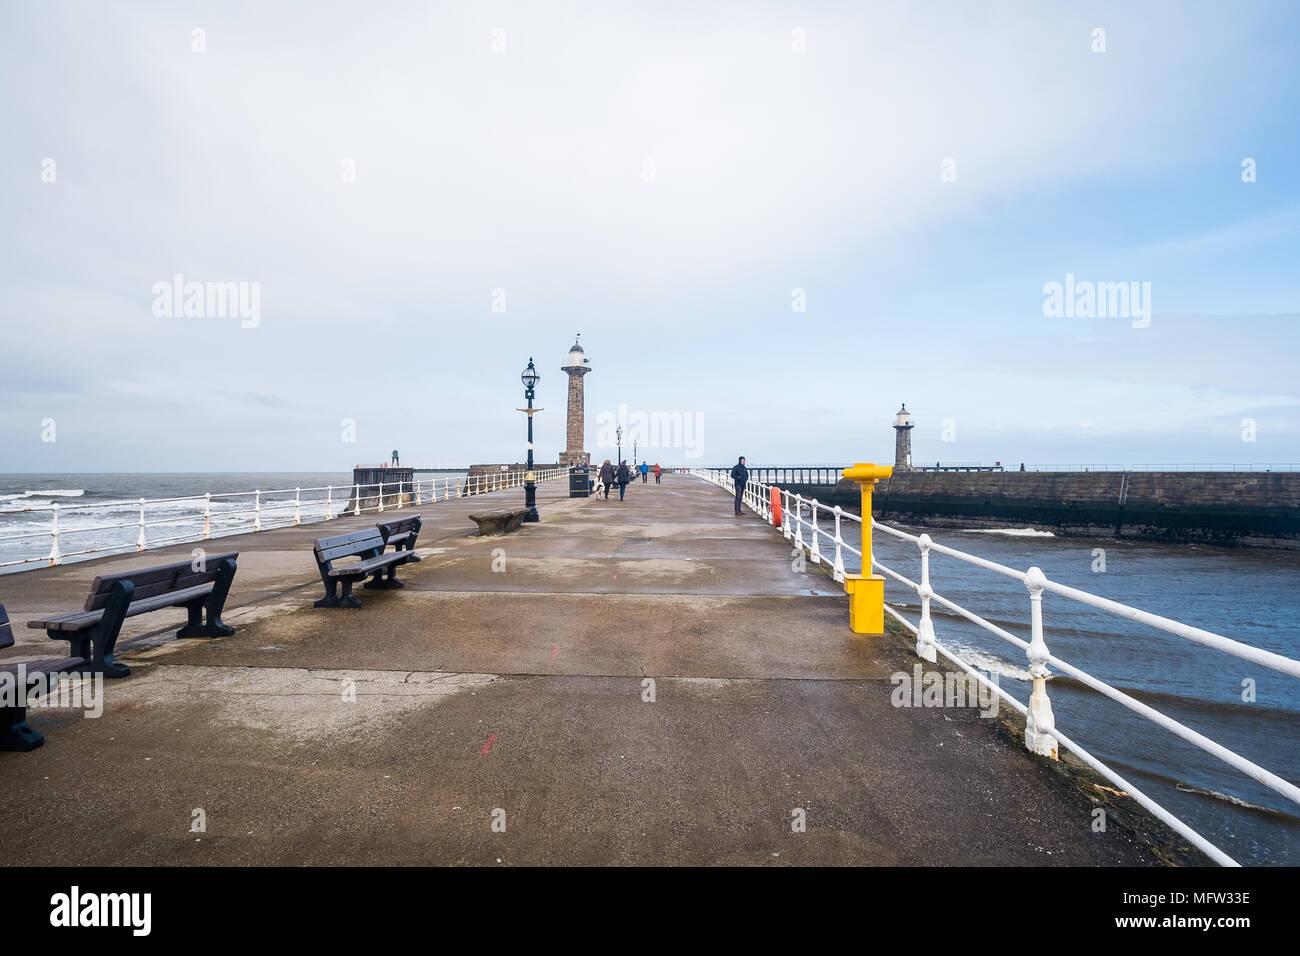 Whitby Pier, North Yorkshire, UK - Stock Image